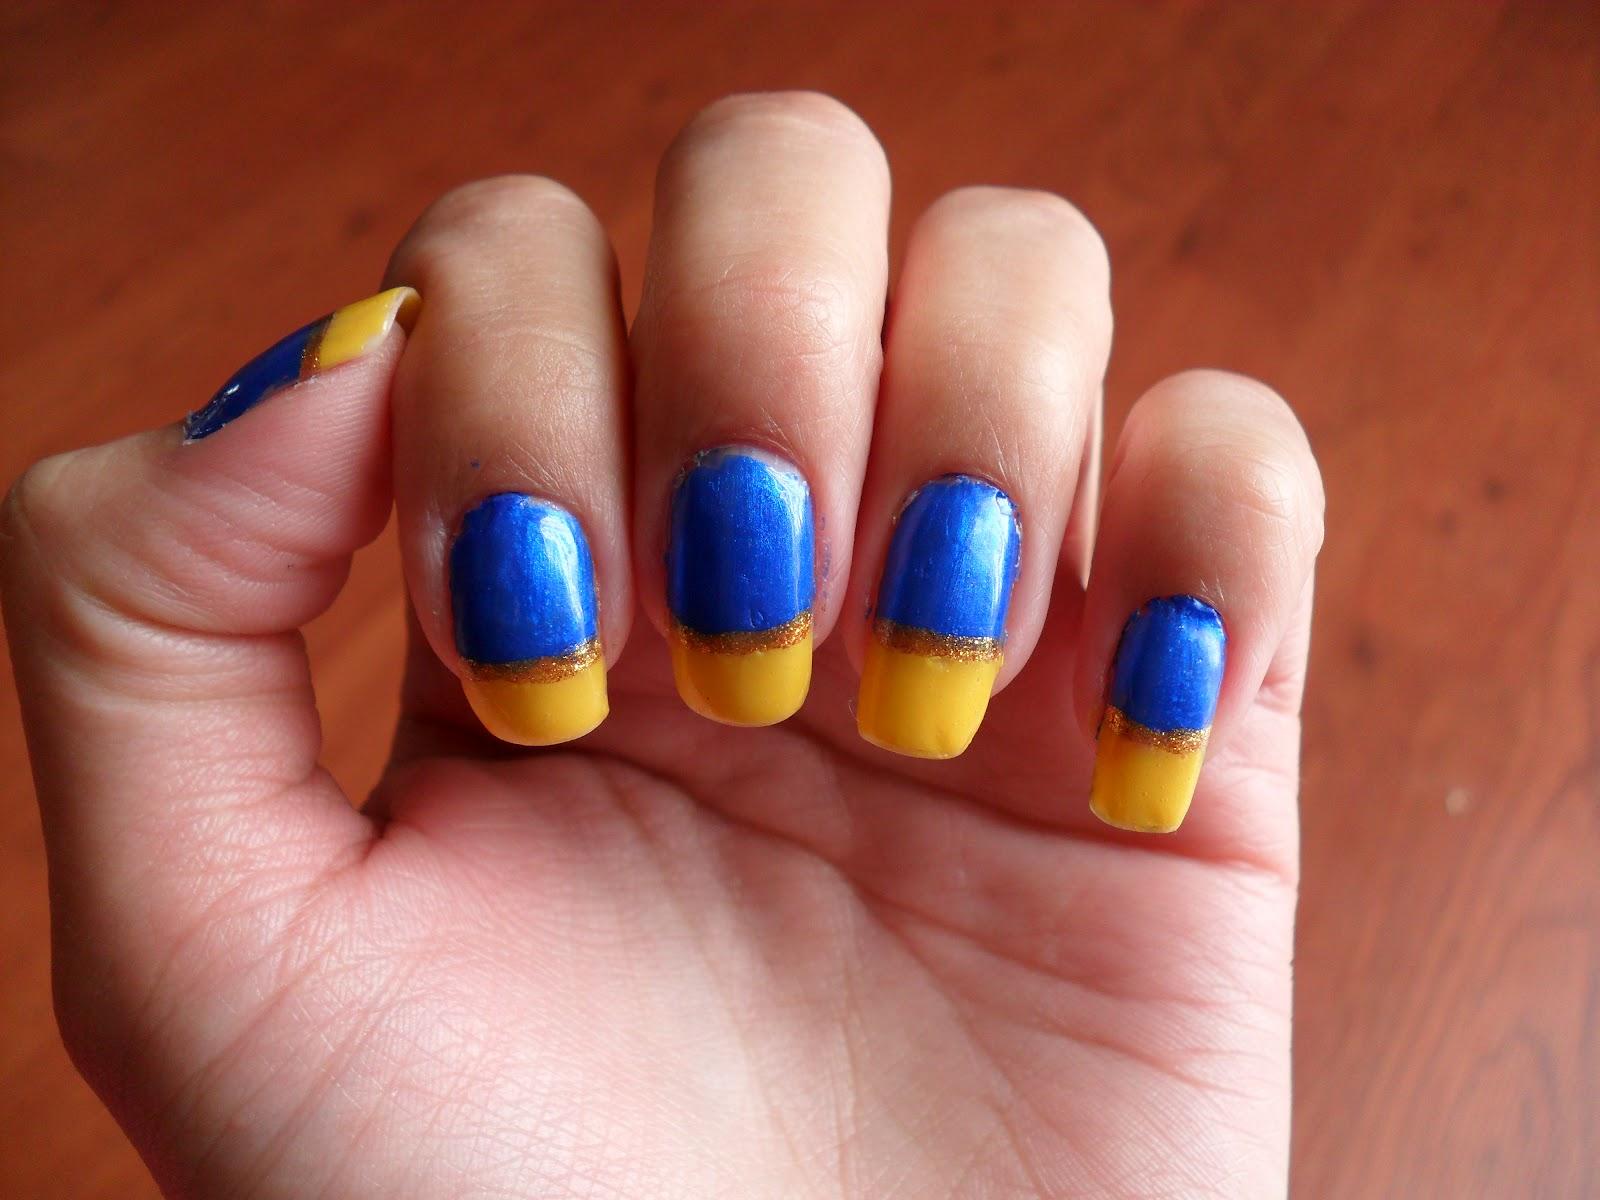 Маникюр с желтым и синим лаком фото